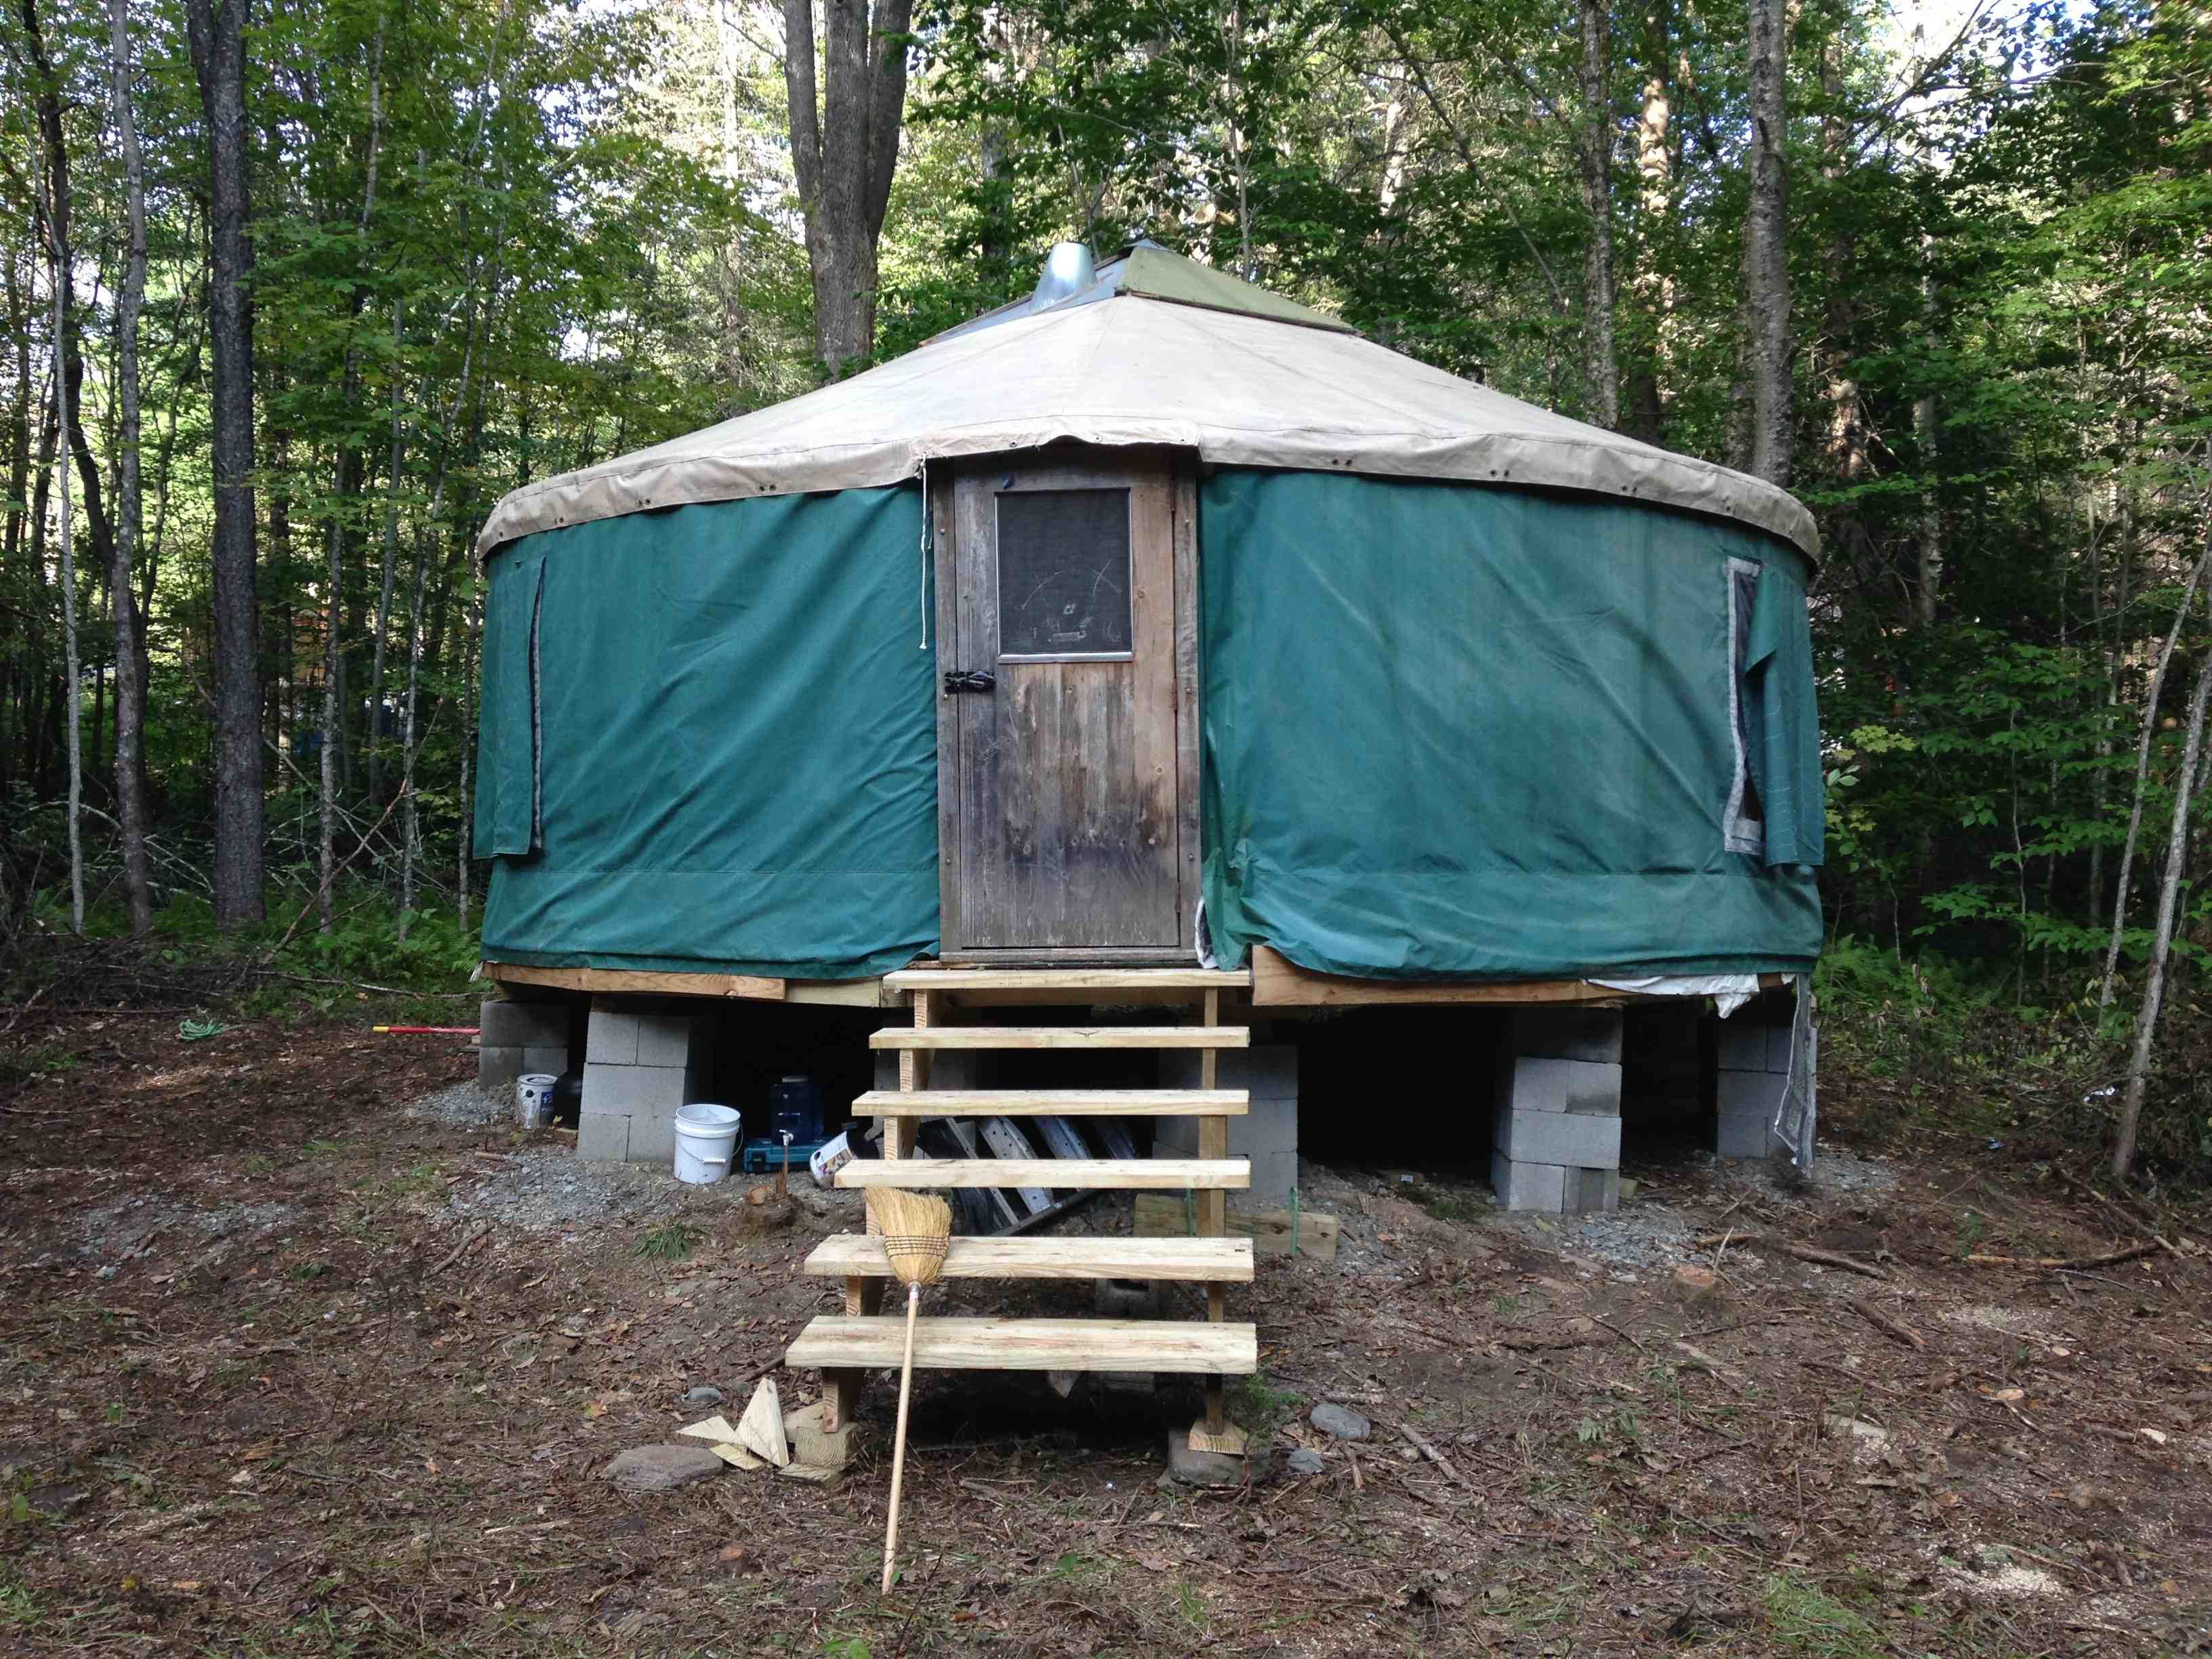 Luxury Camping In Vermont Yurt Rental In Vermont